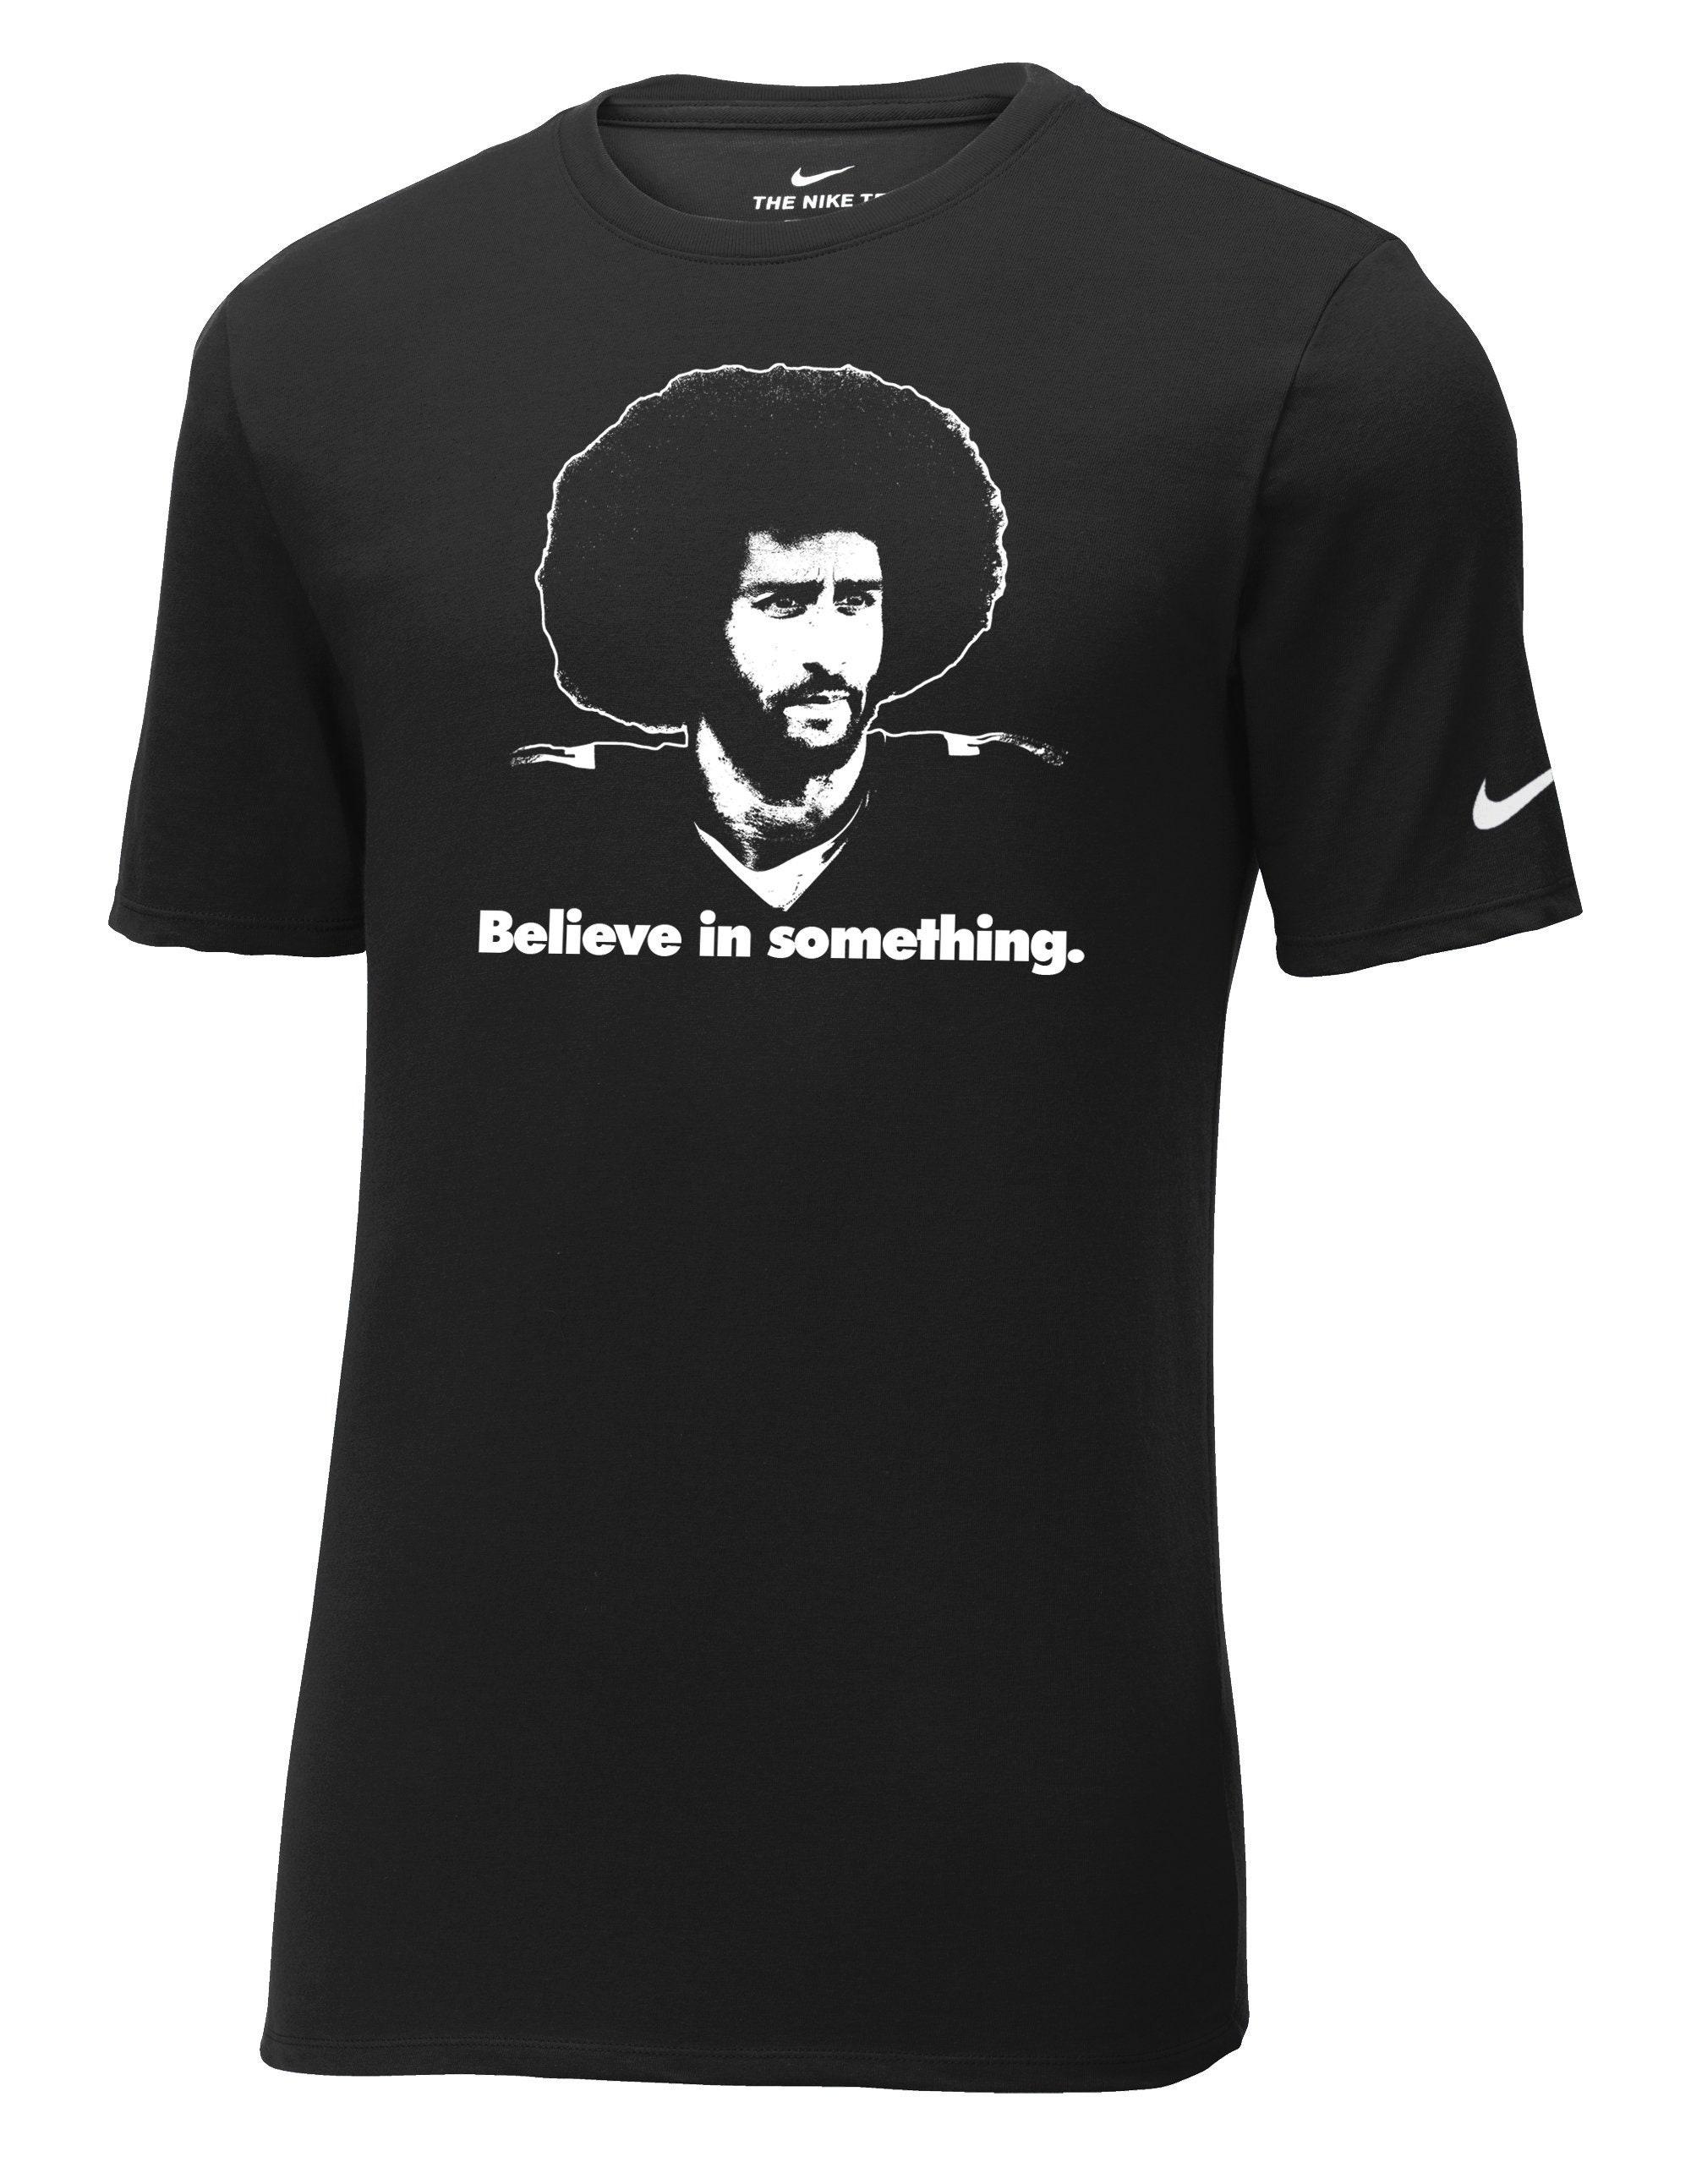 72f4f88e4 Colin Kaepernick Shirts Just Do It Nike ad campaign | Etsy